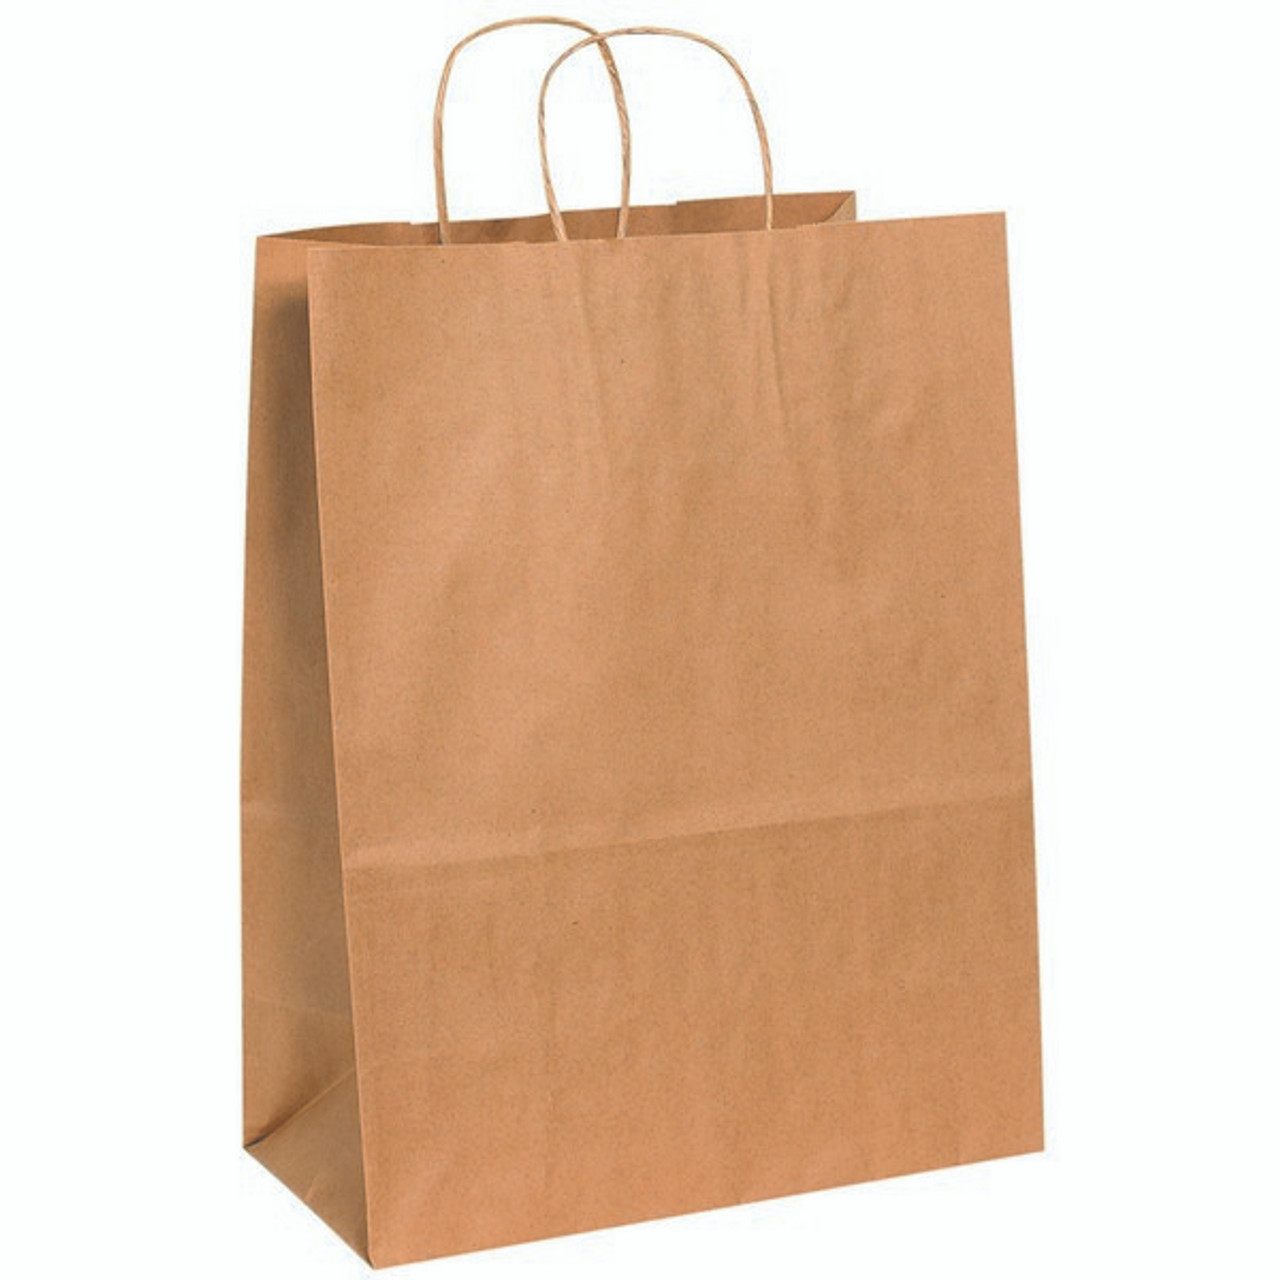 13in X 7in X 17in Kraft Paper Bags With Handles Berlin